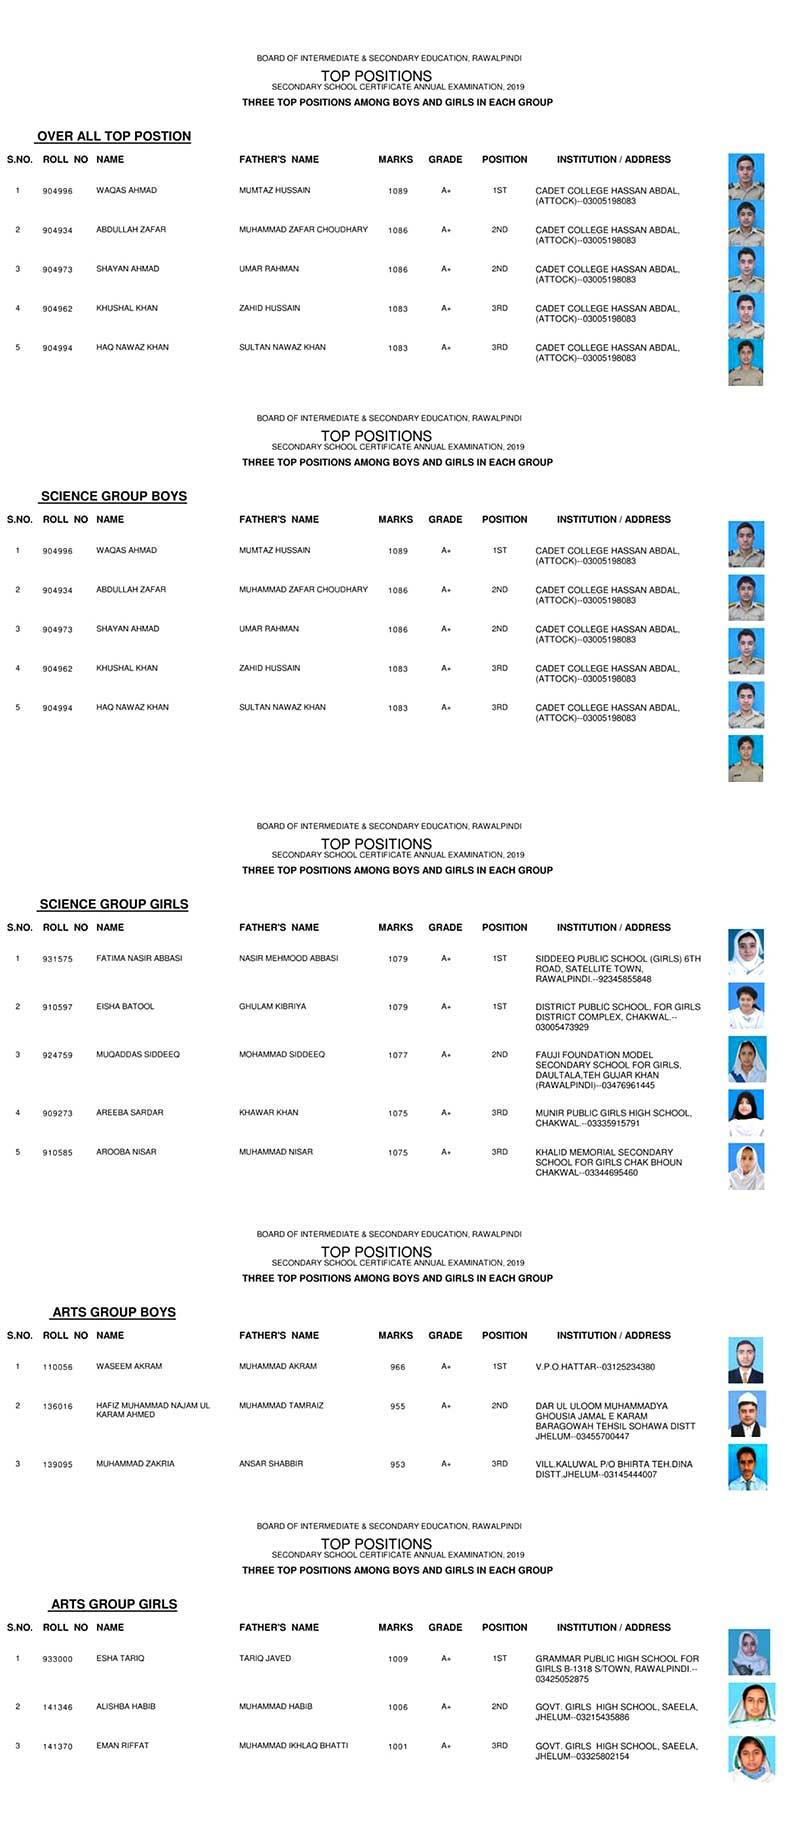 BISE Rawalpindi Matric Position Holders 2019